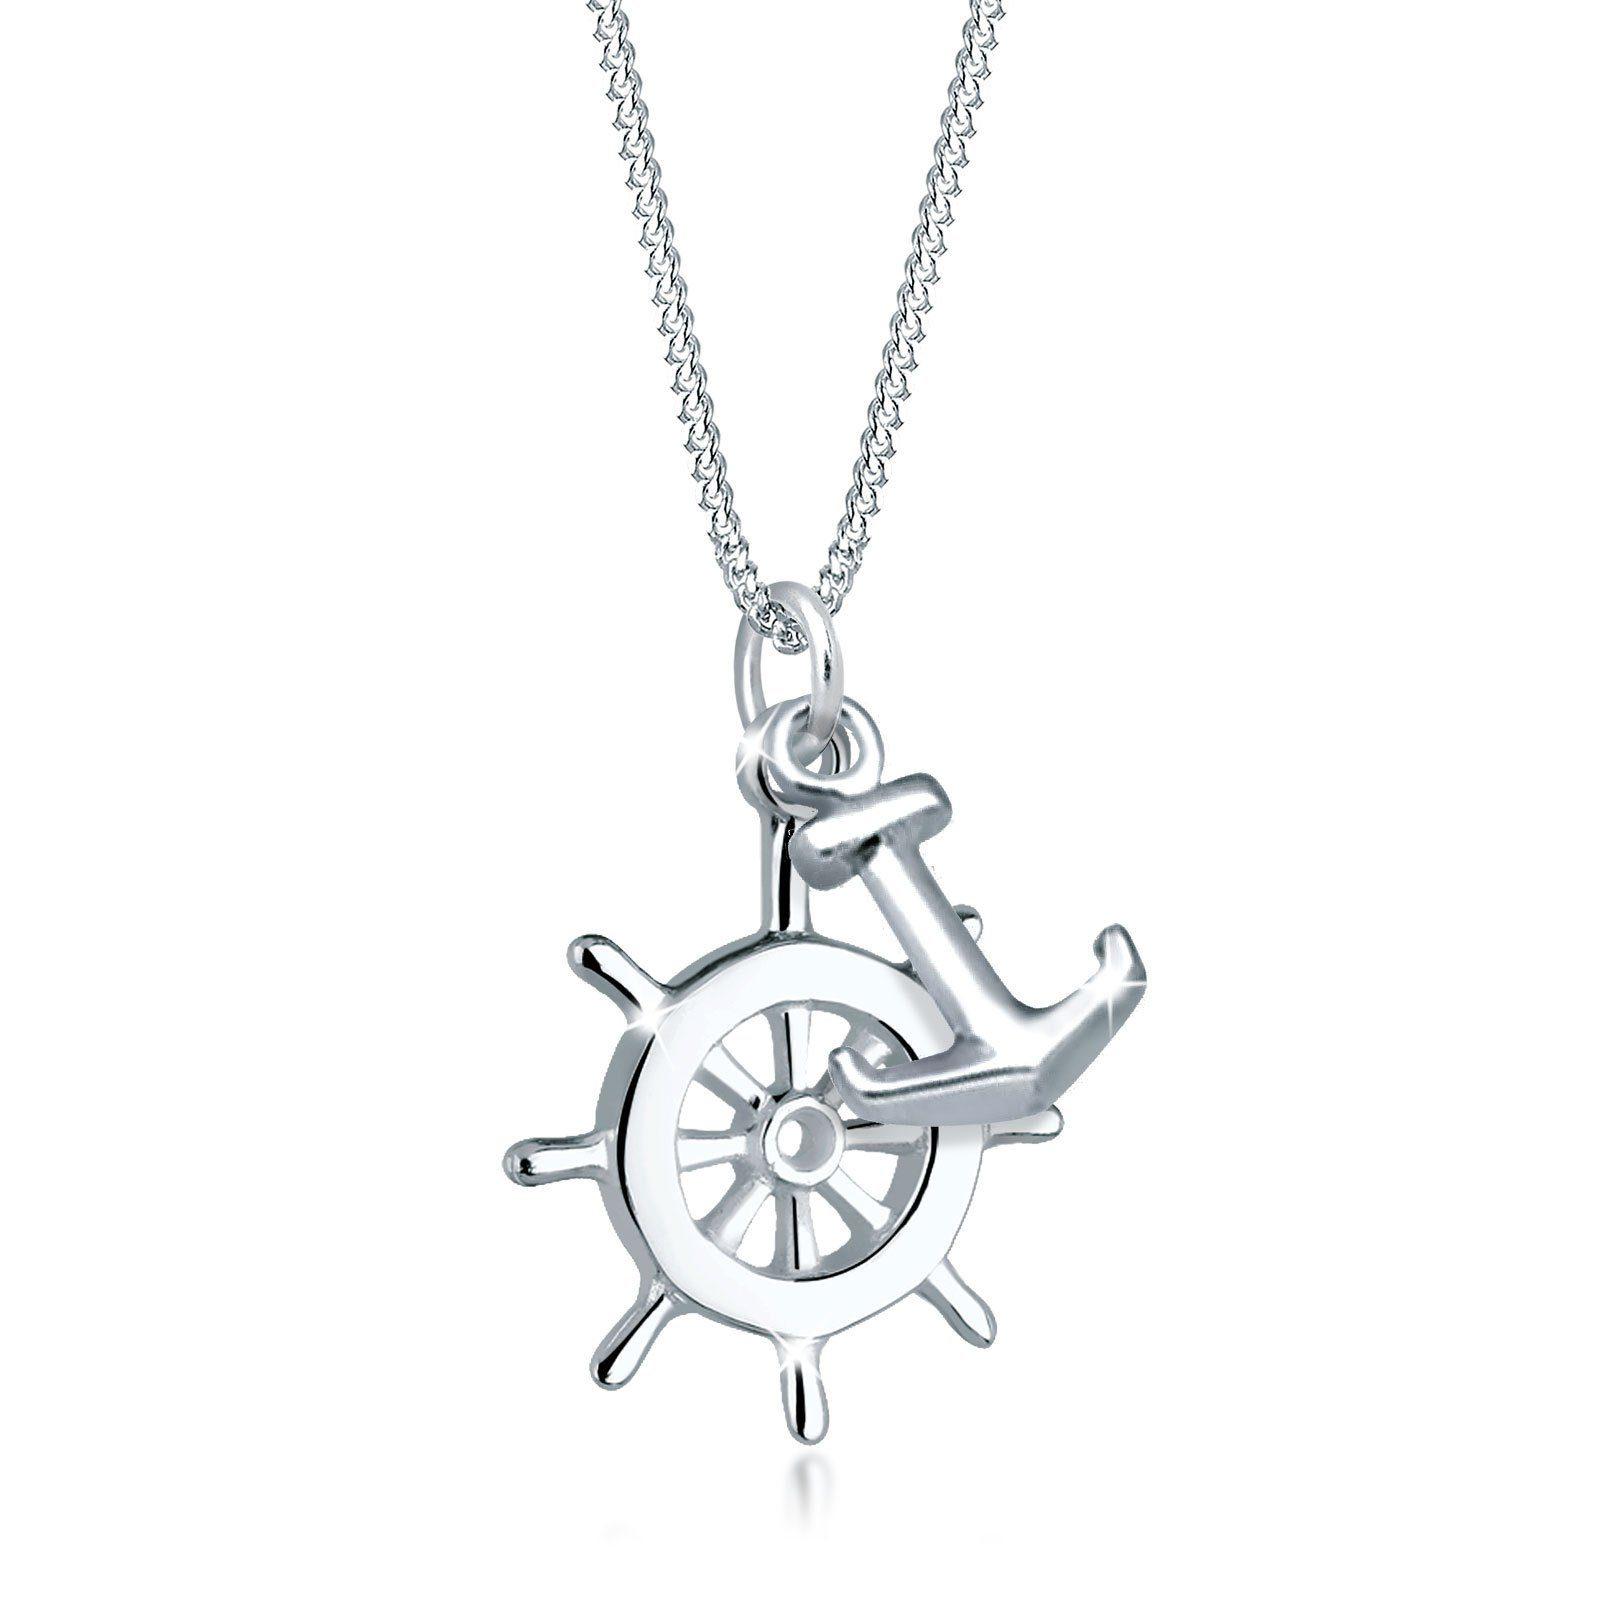 Elli Halskette »Steuerrad Anker Maritim 925 Sterling Silber«